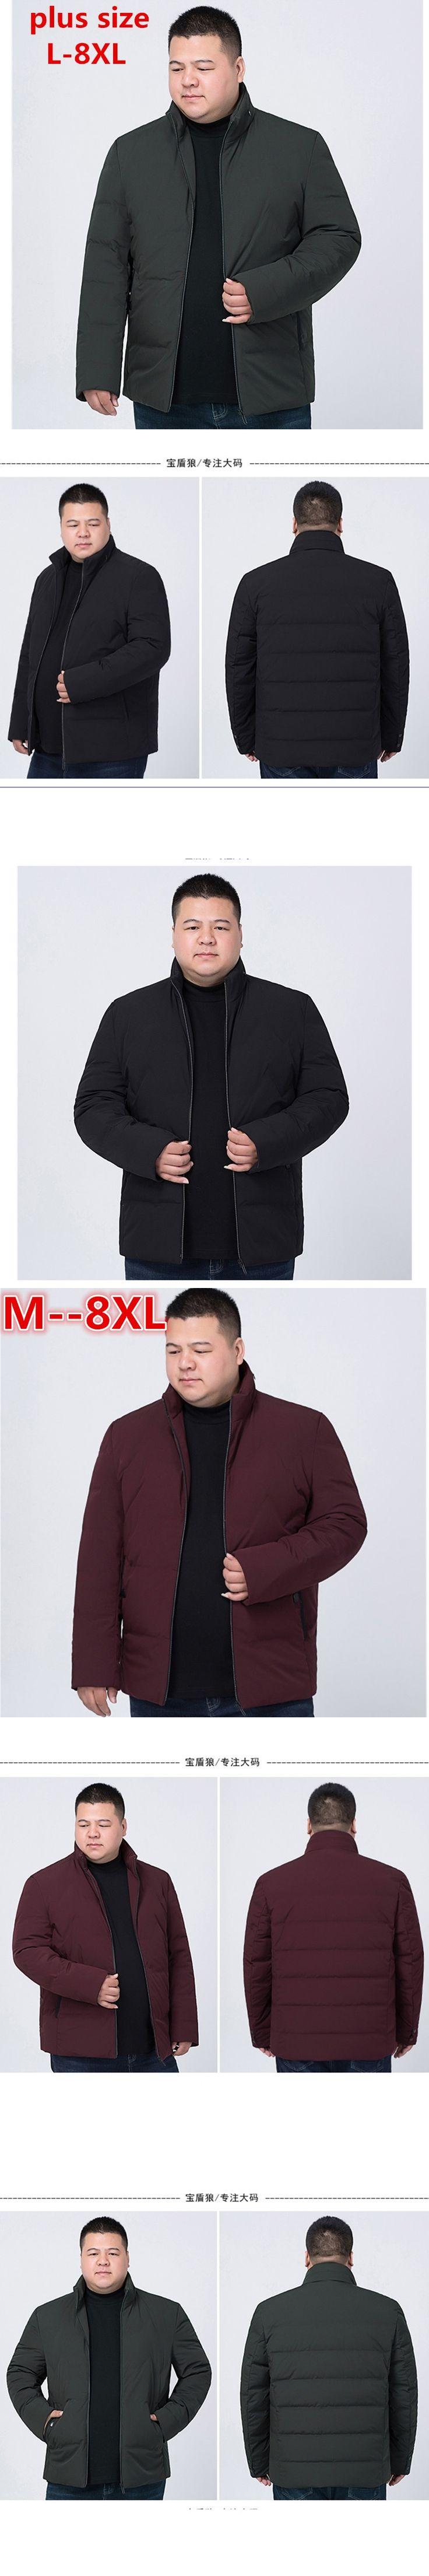 new BIG SIZE 8XL 7XL 6XL 2017 Hot Sale Men Winter Splicing Cotton-Padded Coat Jacket Winter Parkas High Quality plus large size